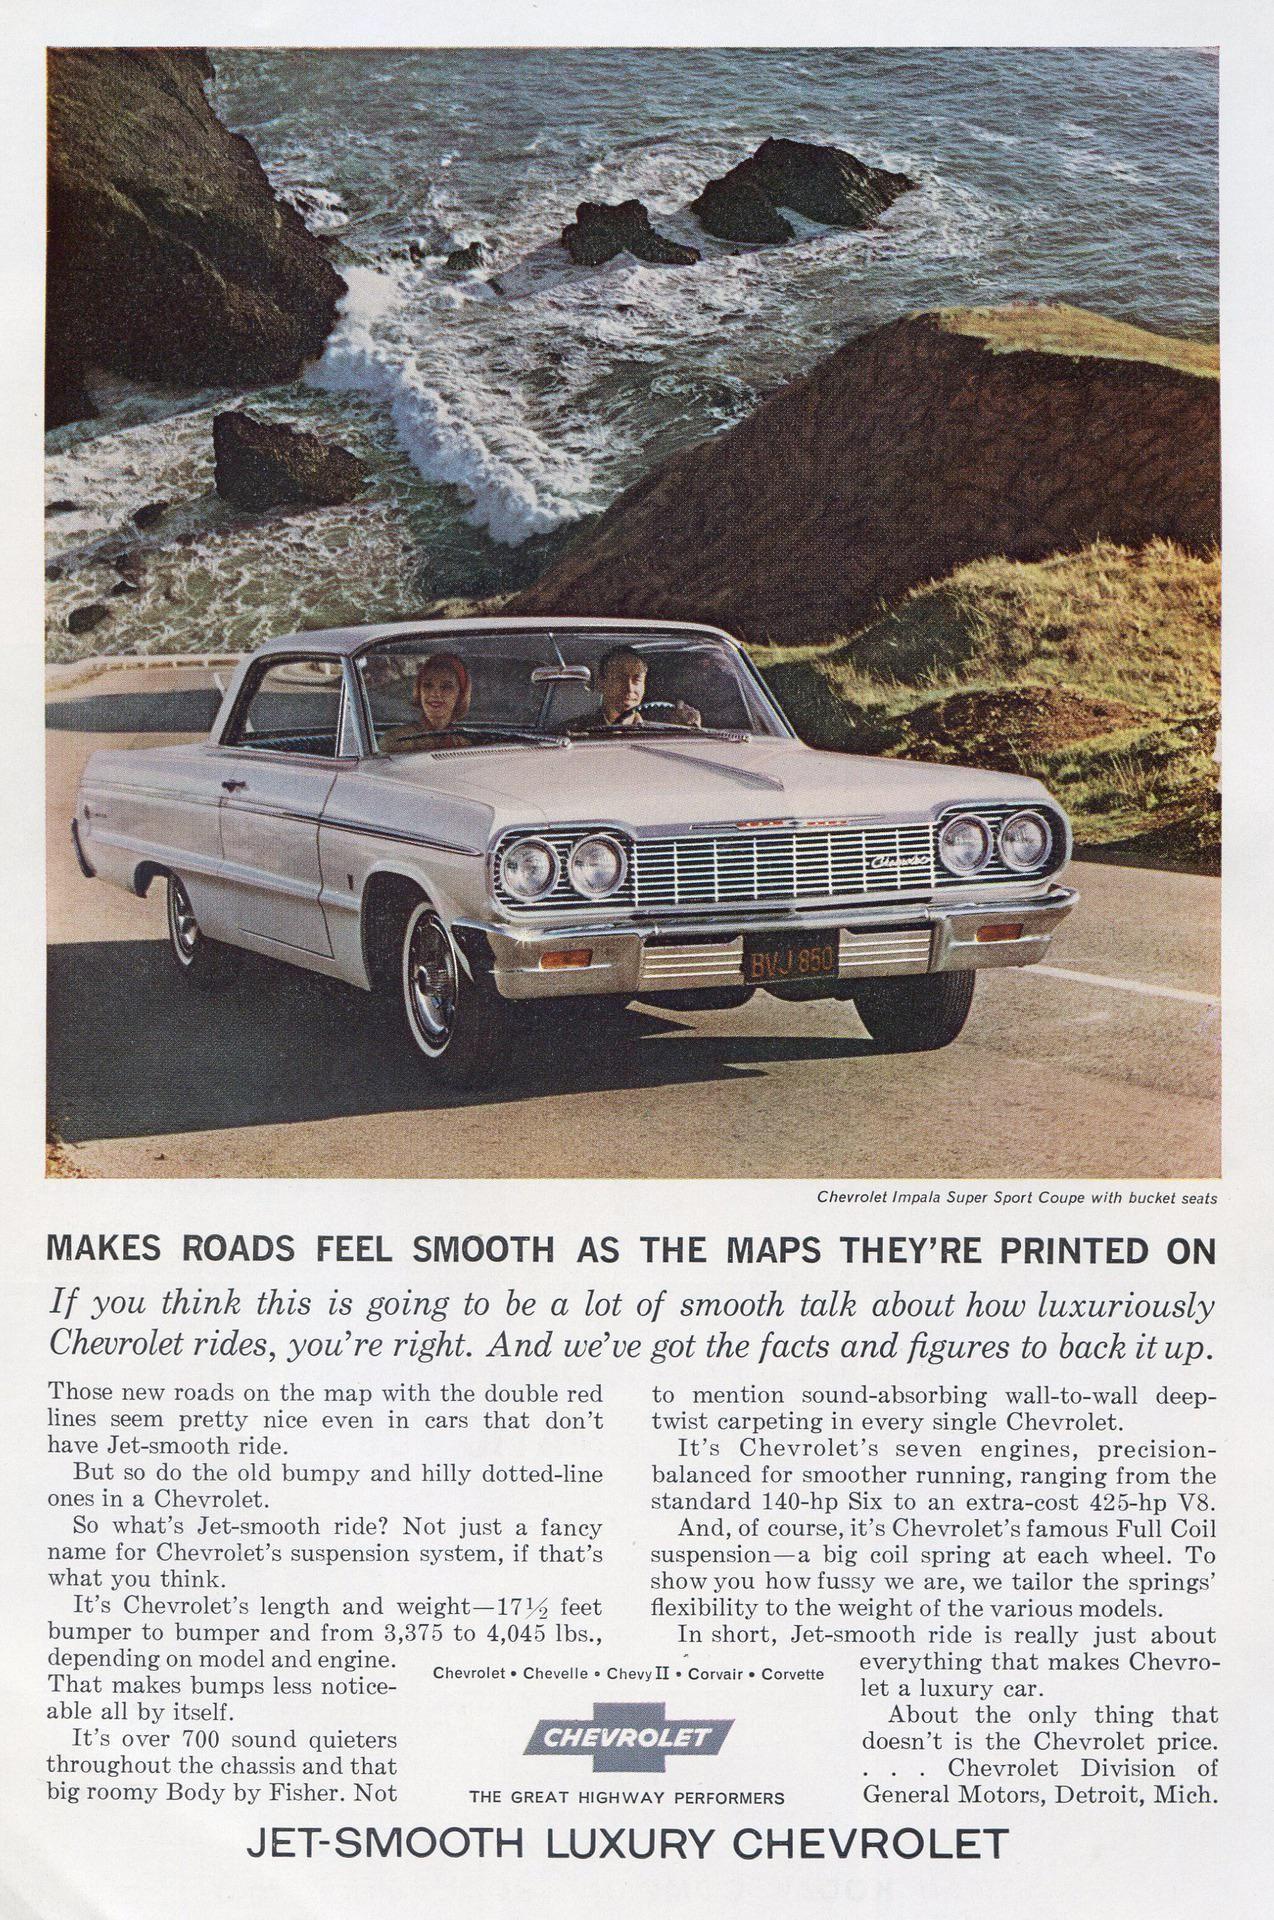 National Geographic April 1964 Vintageads Ads Vintage Printad